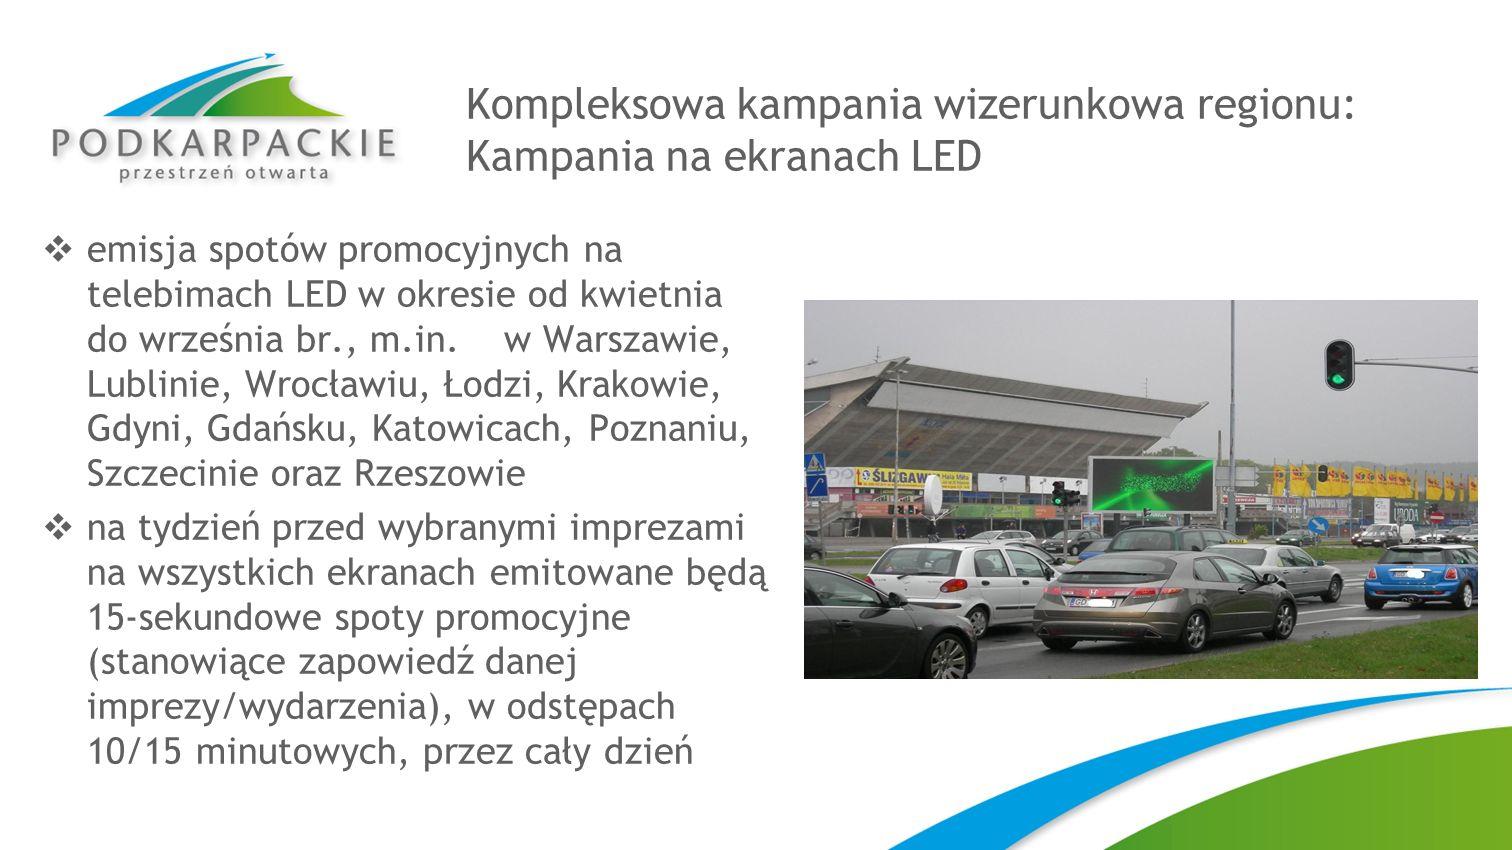 Kompleksowa kampania wizerunkowa regionu: Kampania na ekranach LED